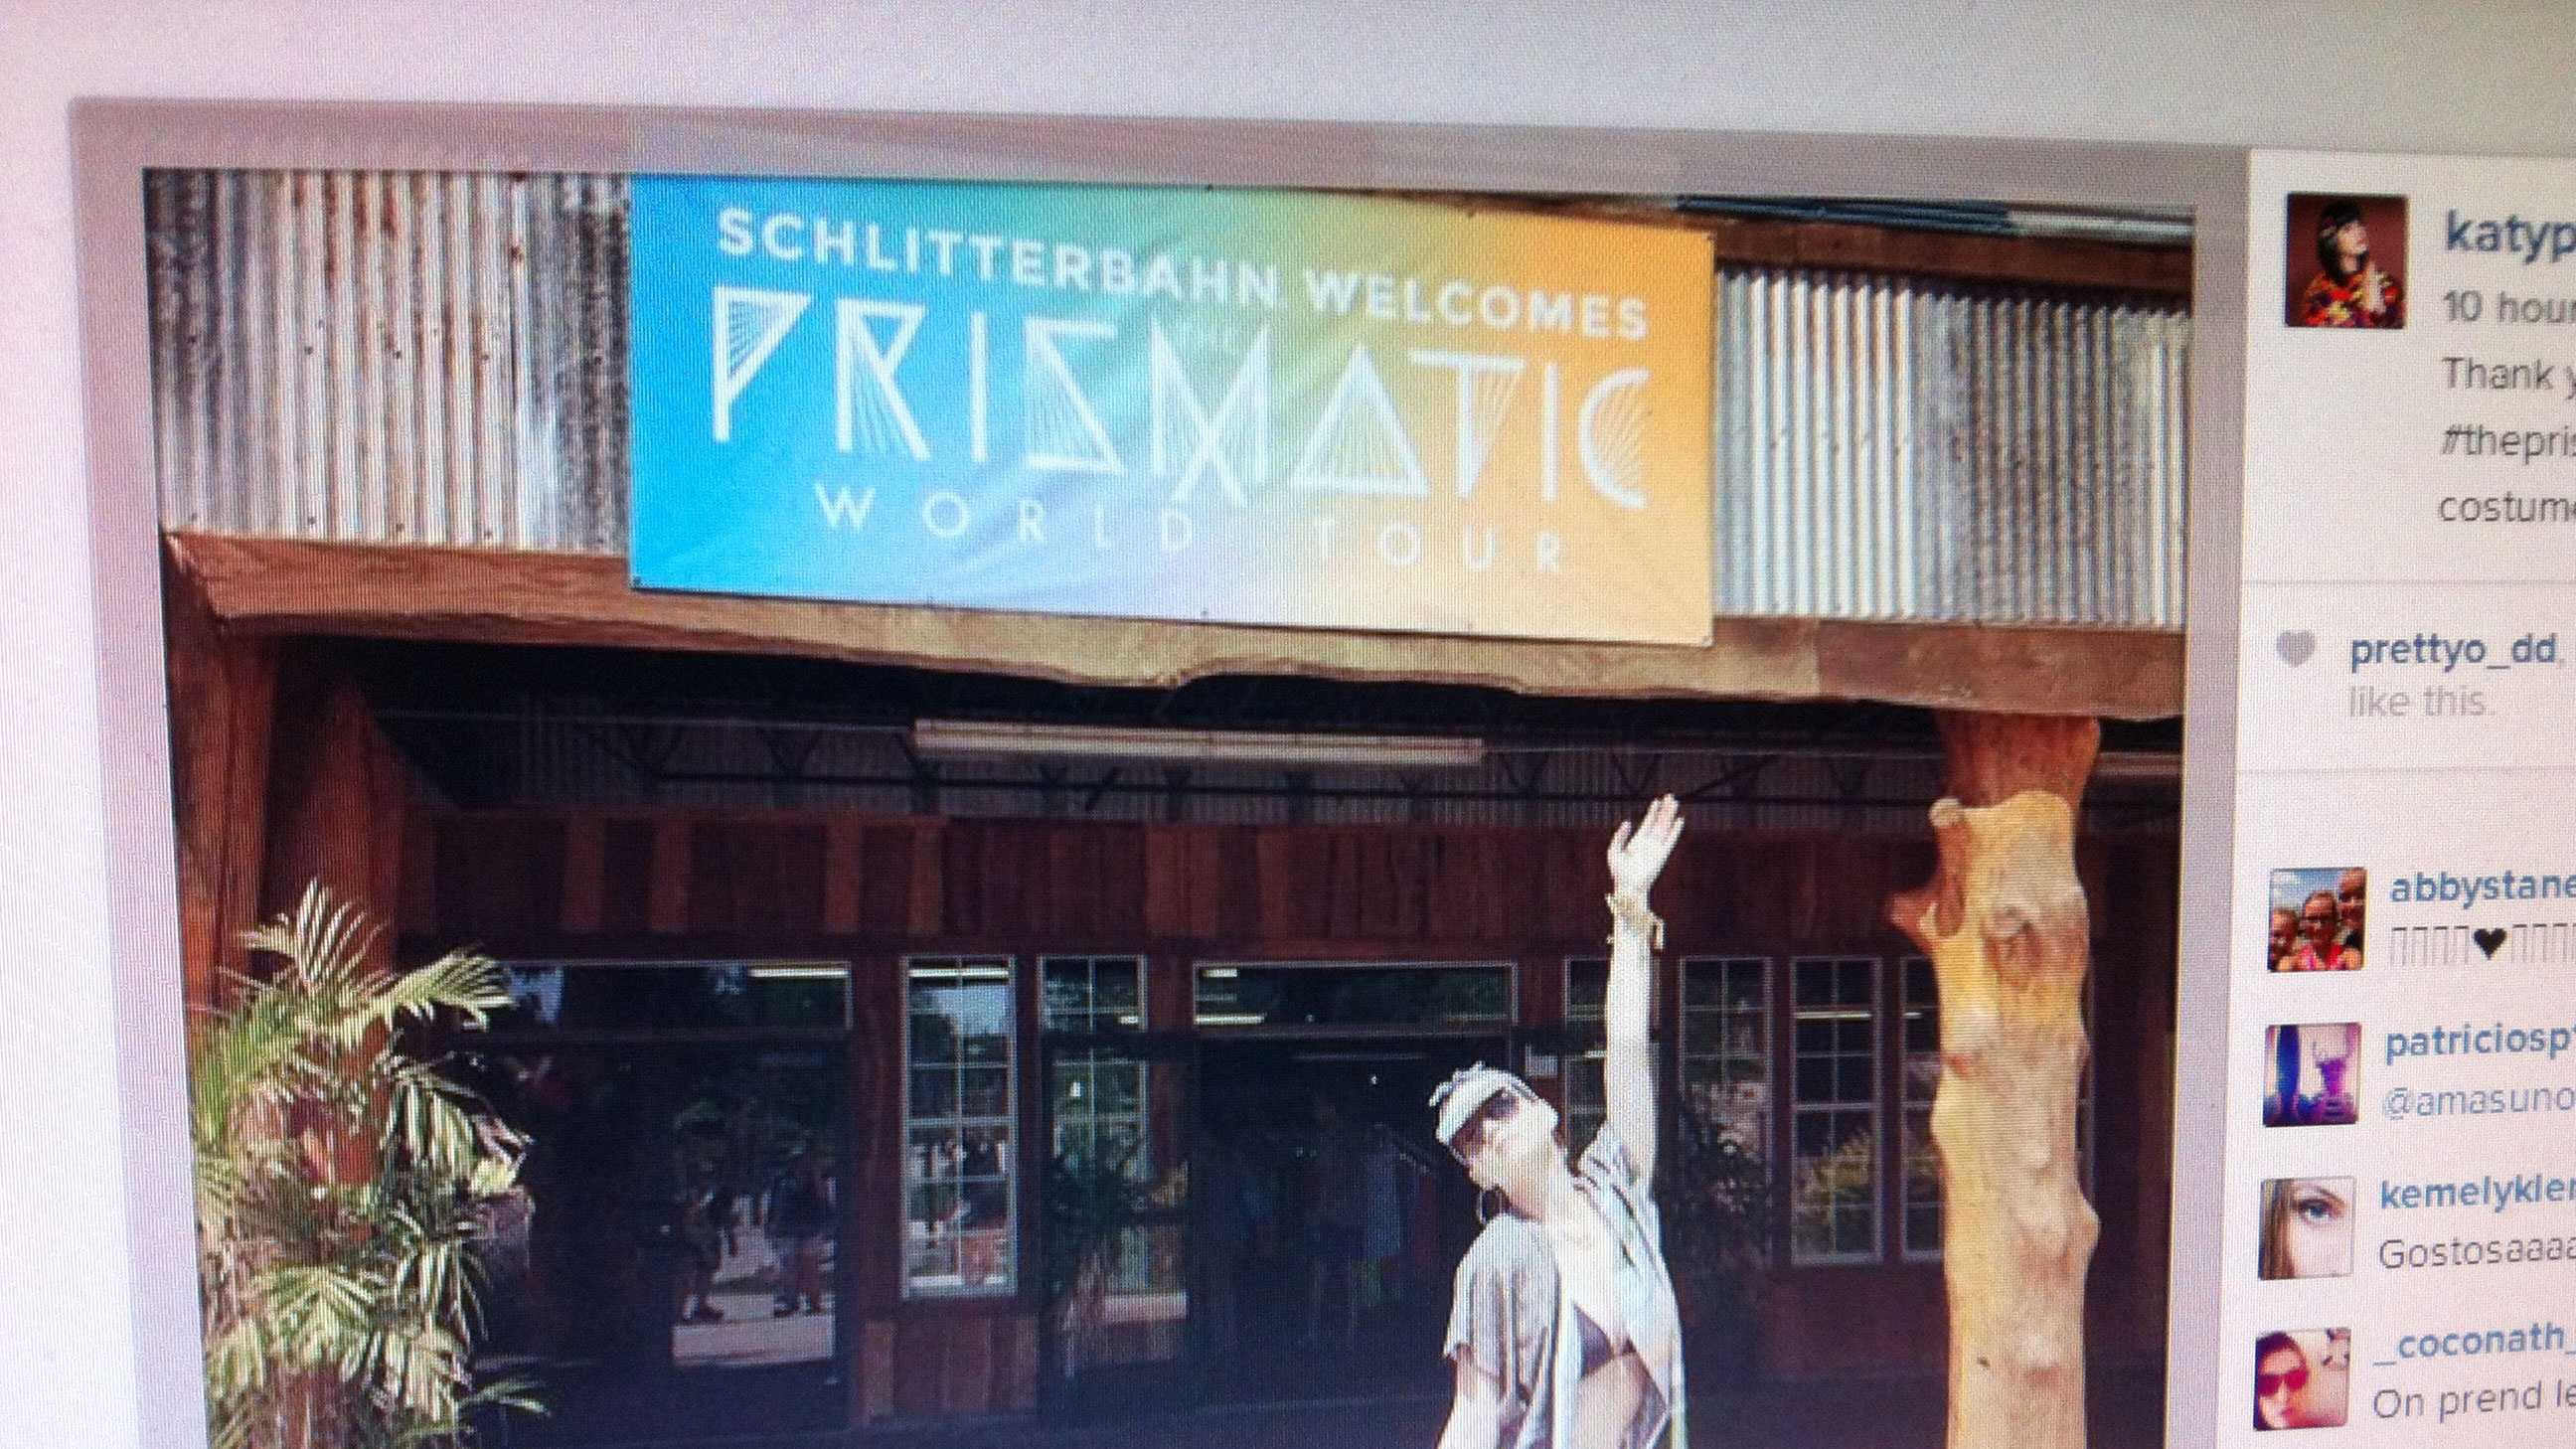 Katy Perry at Schlitterbahn